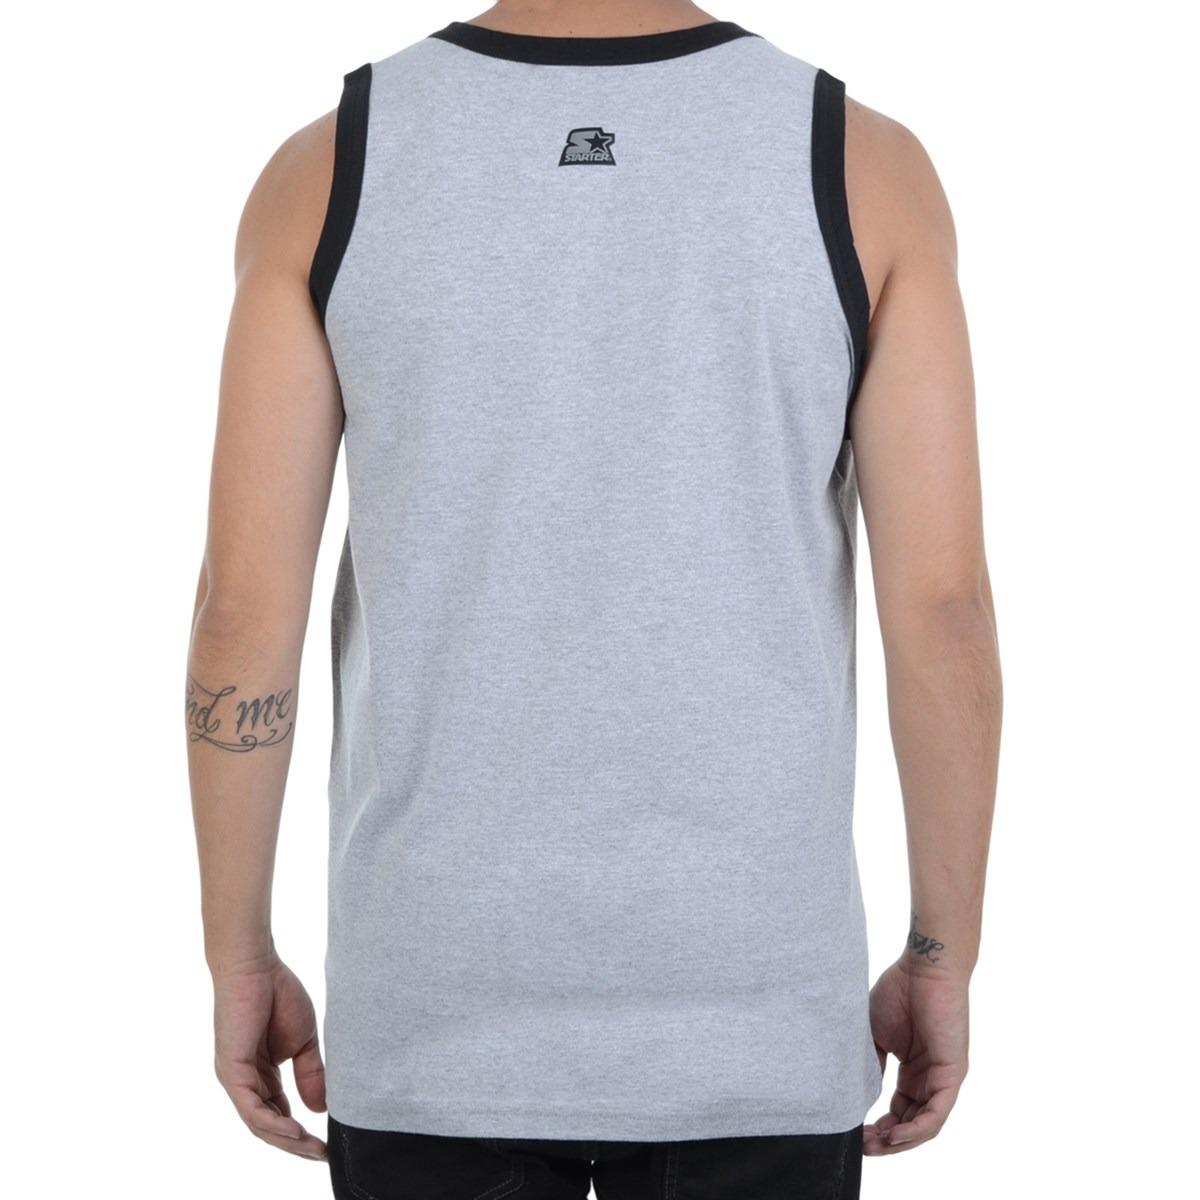 60106ece42 Camiseta Masculina Starter Regata Black Label - R$ 38,00 em Mercado ...